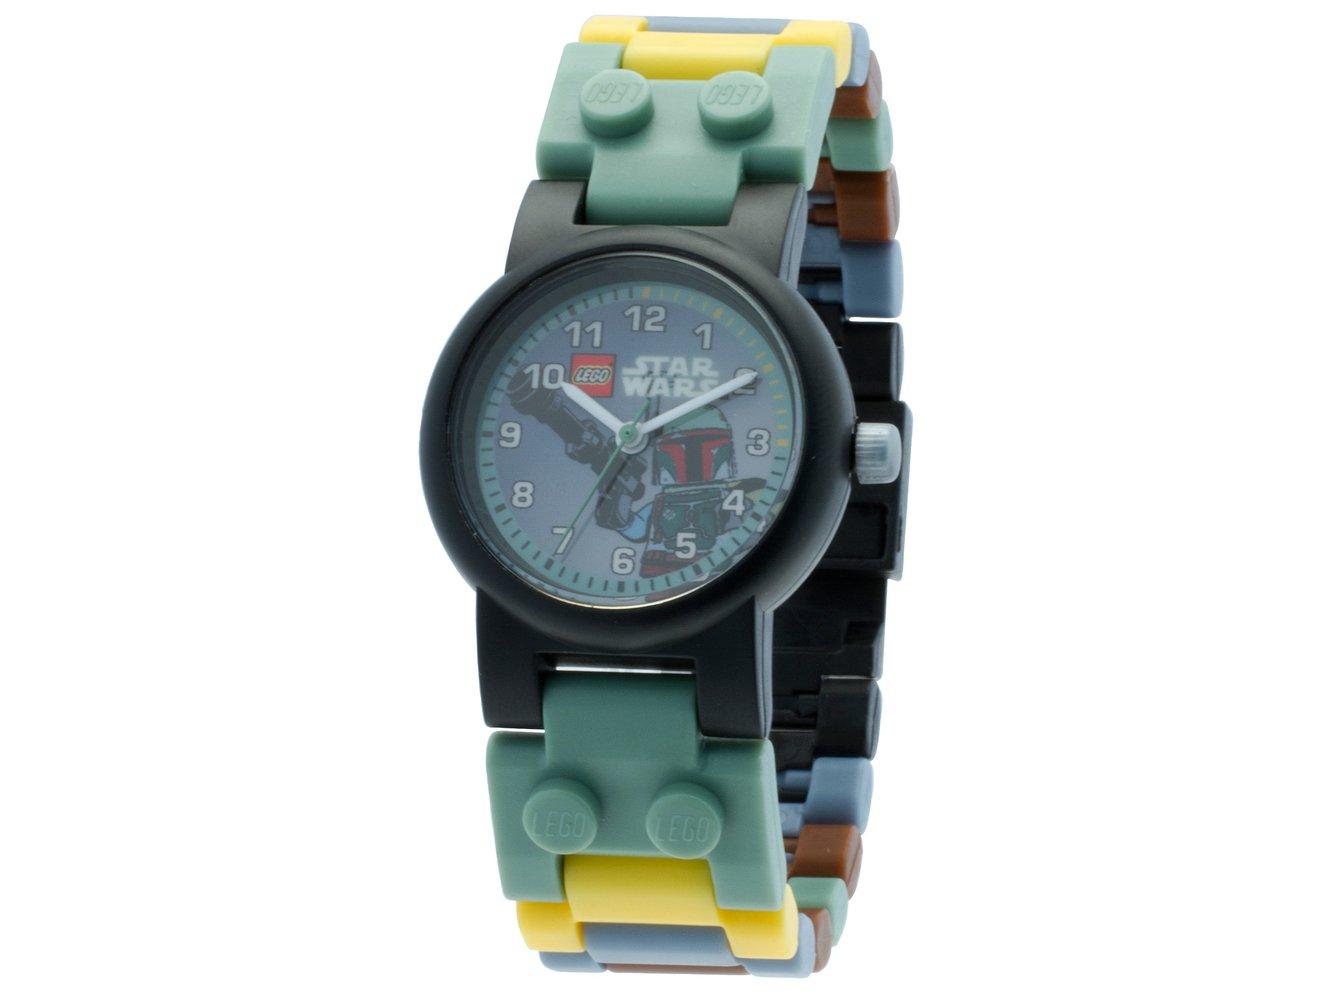 Boba Fett Minifigure Watch